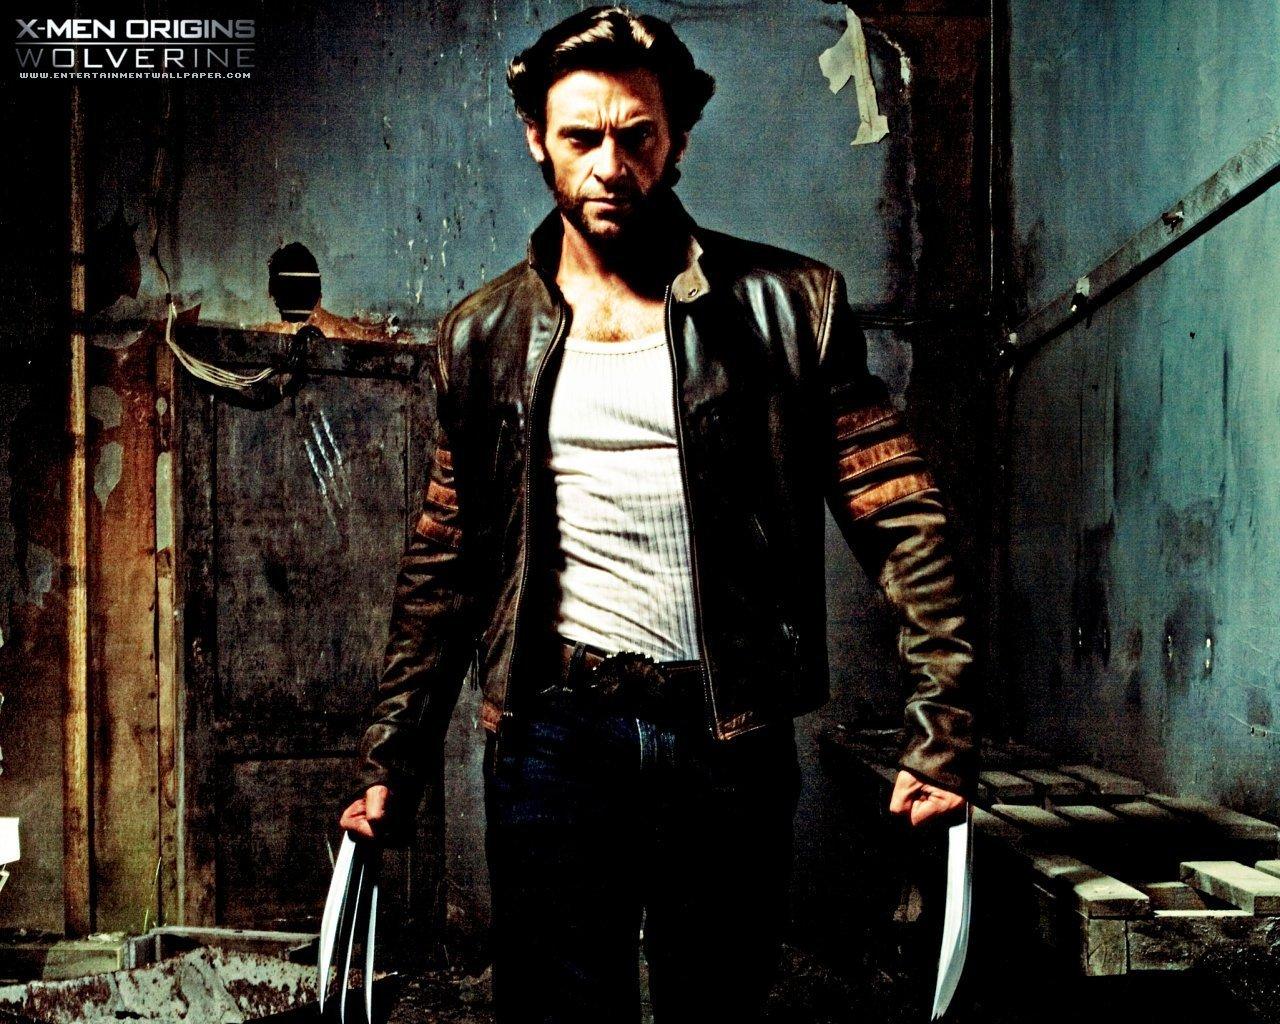 download Men Origins Wolverine Wallpaper Upcoming Movies 1280x1024